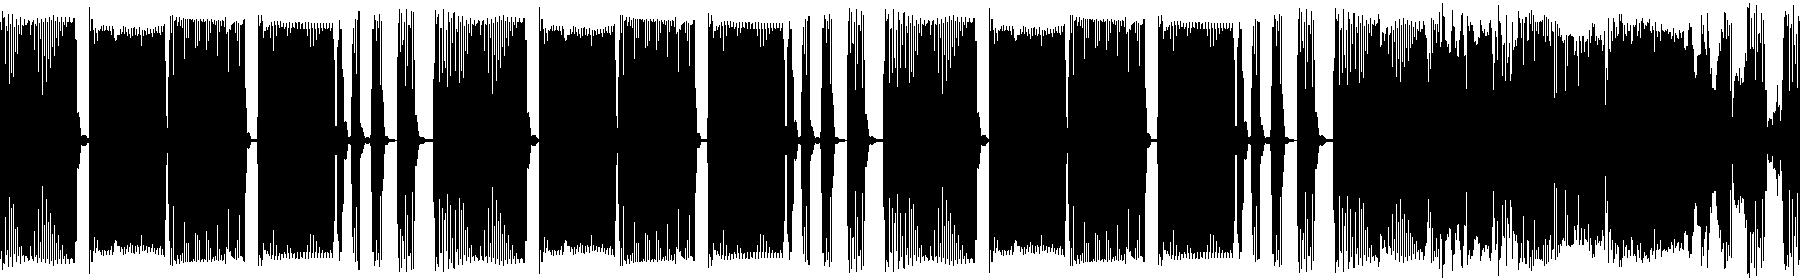 lofier double bassloop 120